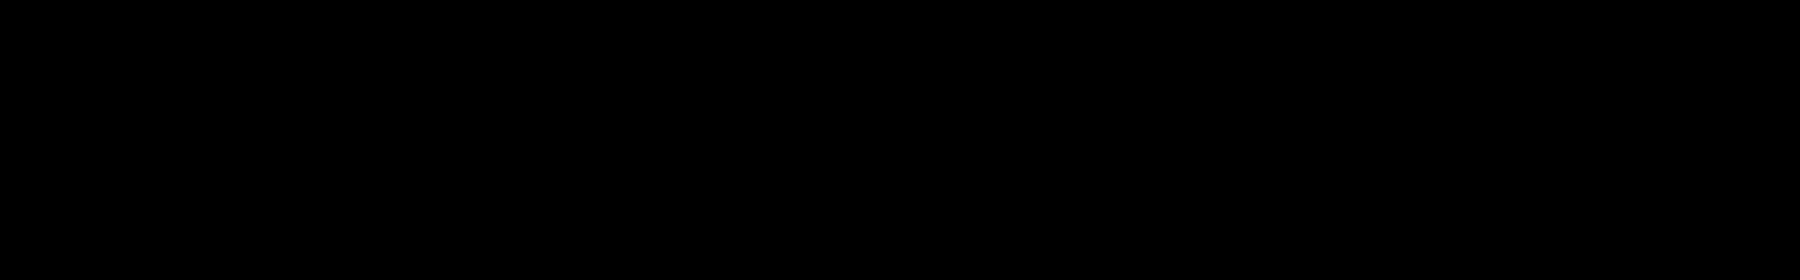 CFA-Sound - Thrillogy-1 Virus TI audio waveform